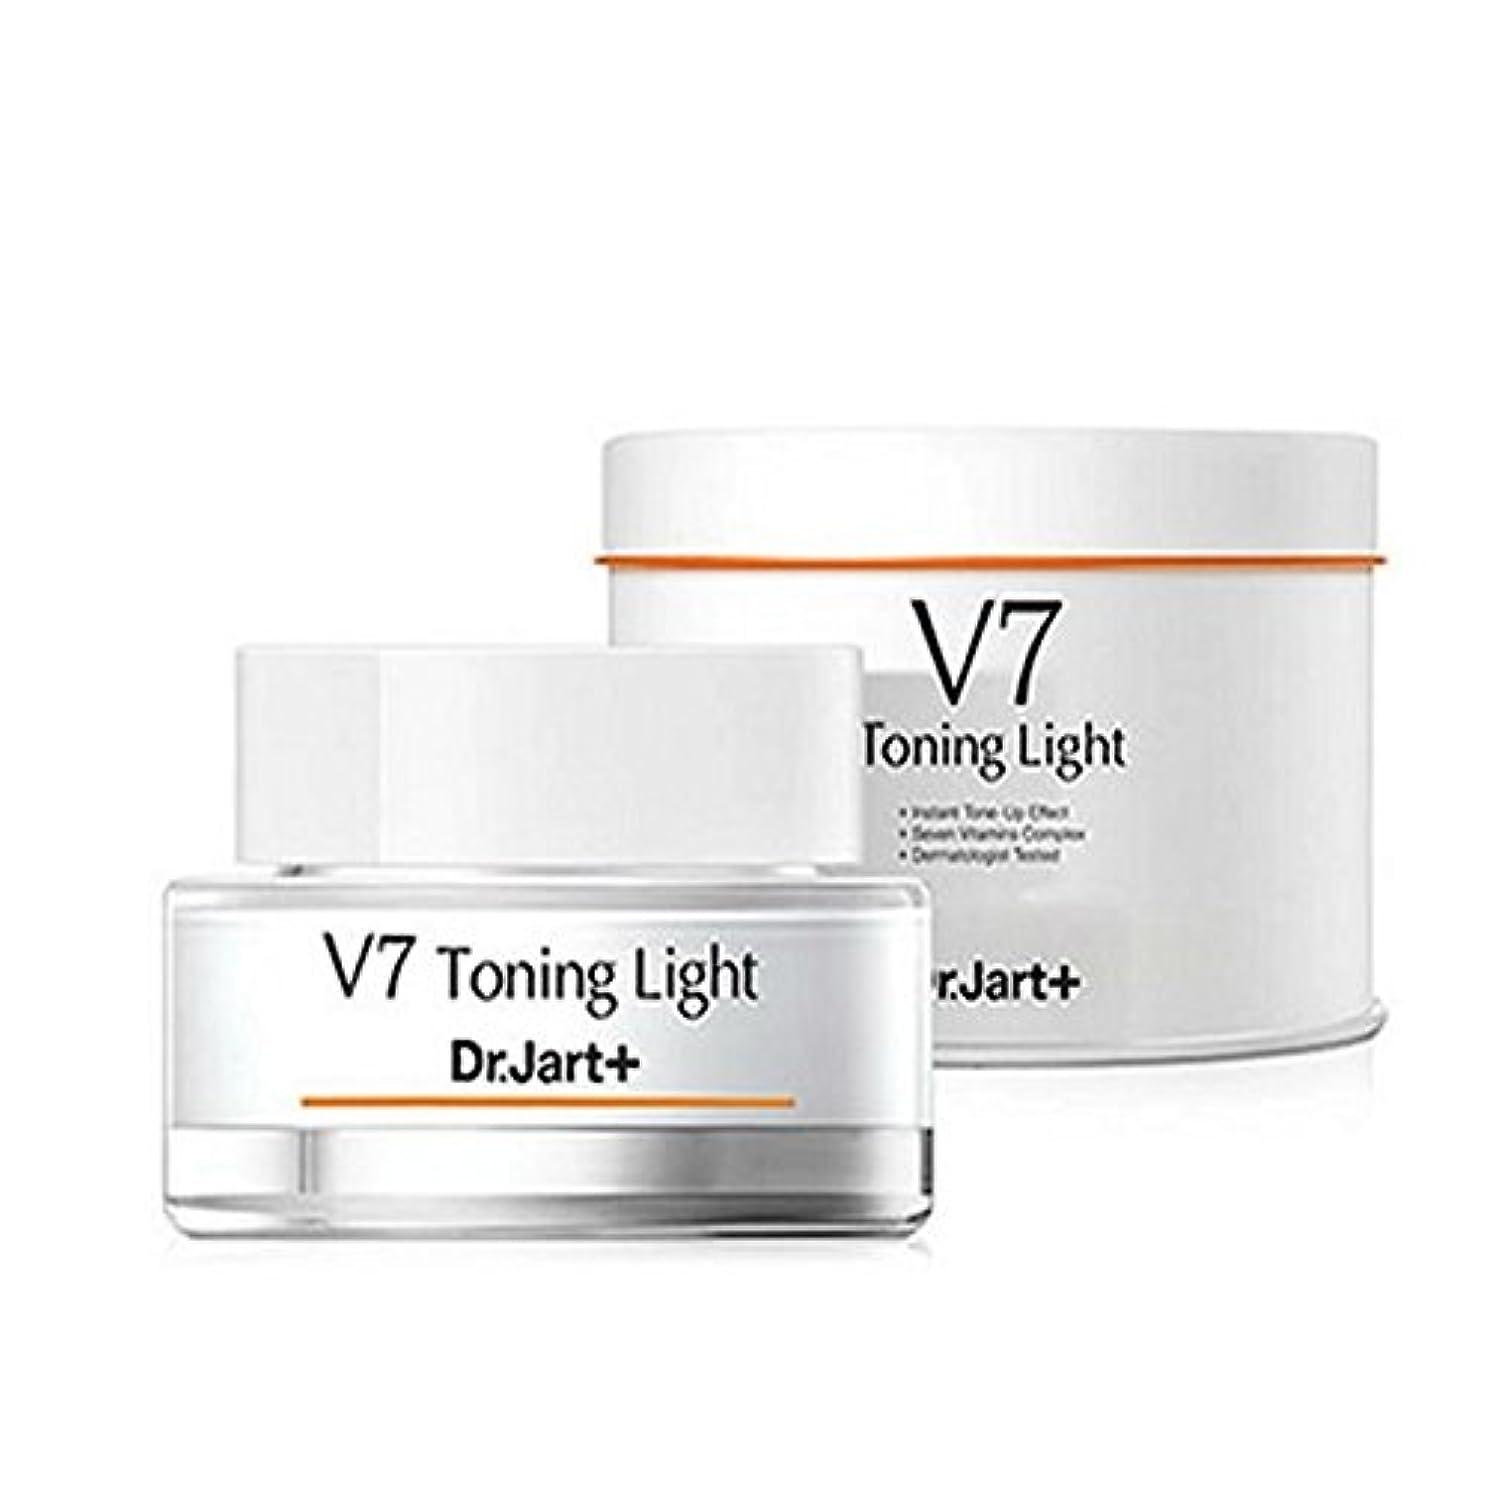 Dr. Jart /ドクタージャルト V7 トーニングライト/V7 Toning Lihgt 50ml/100% Authentic direct from Korea [並行輸入品]